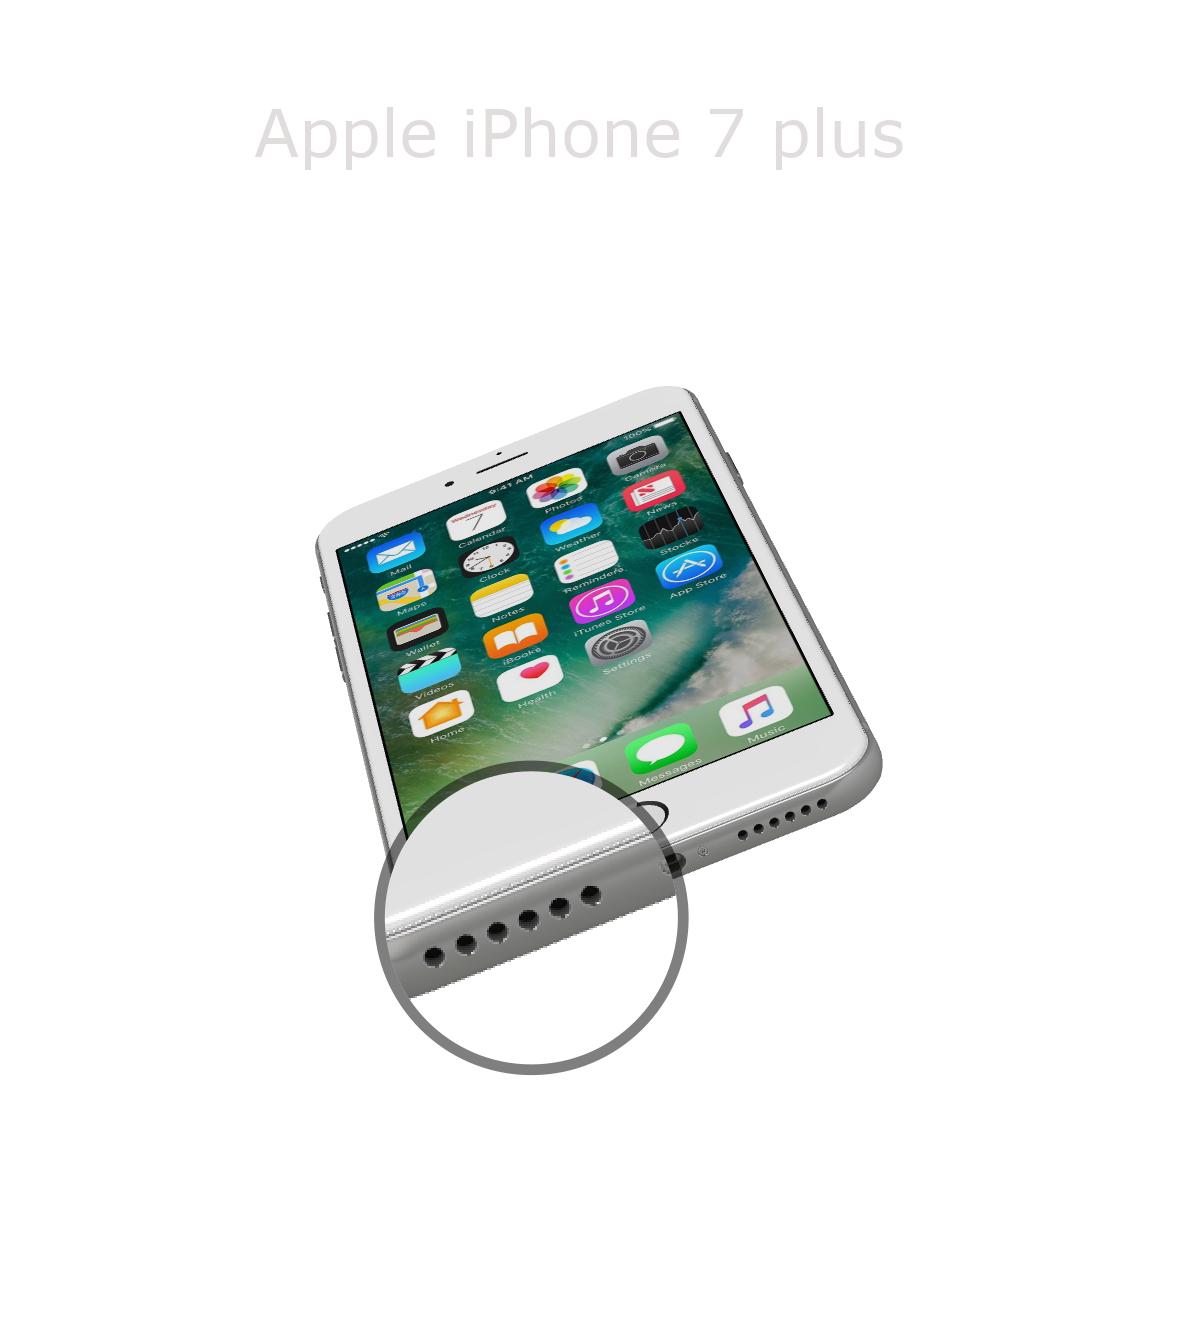 Laga mikrofon iPhone 7 plus